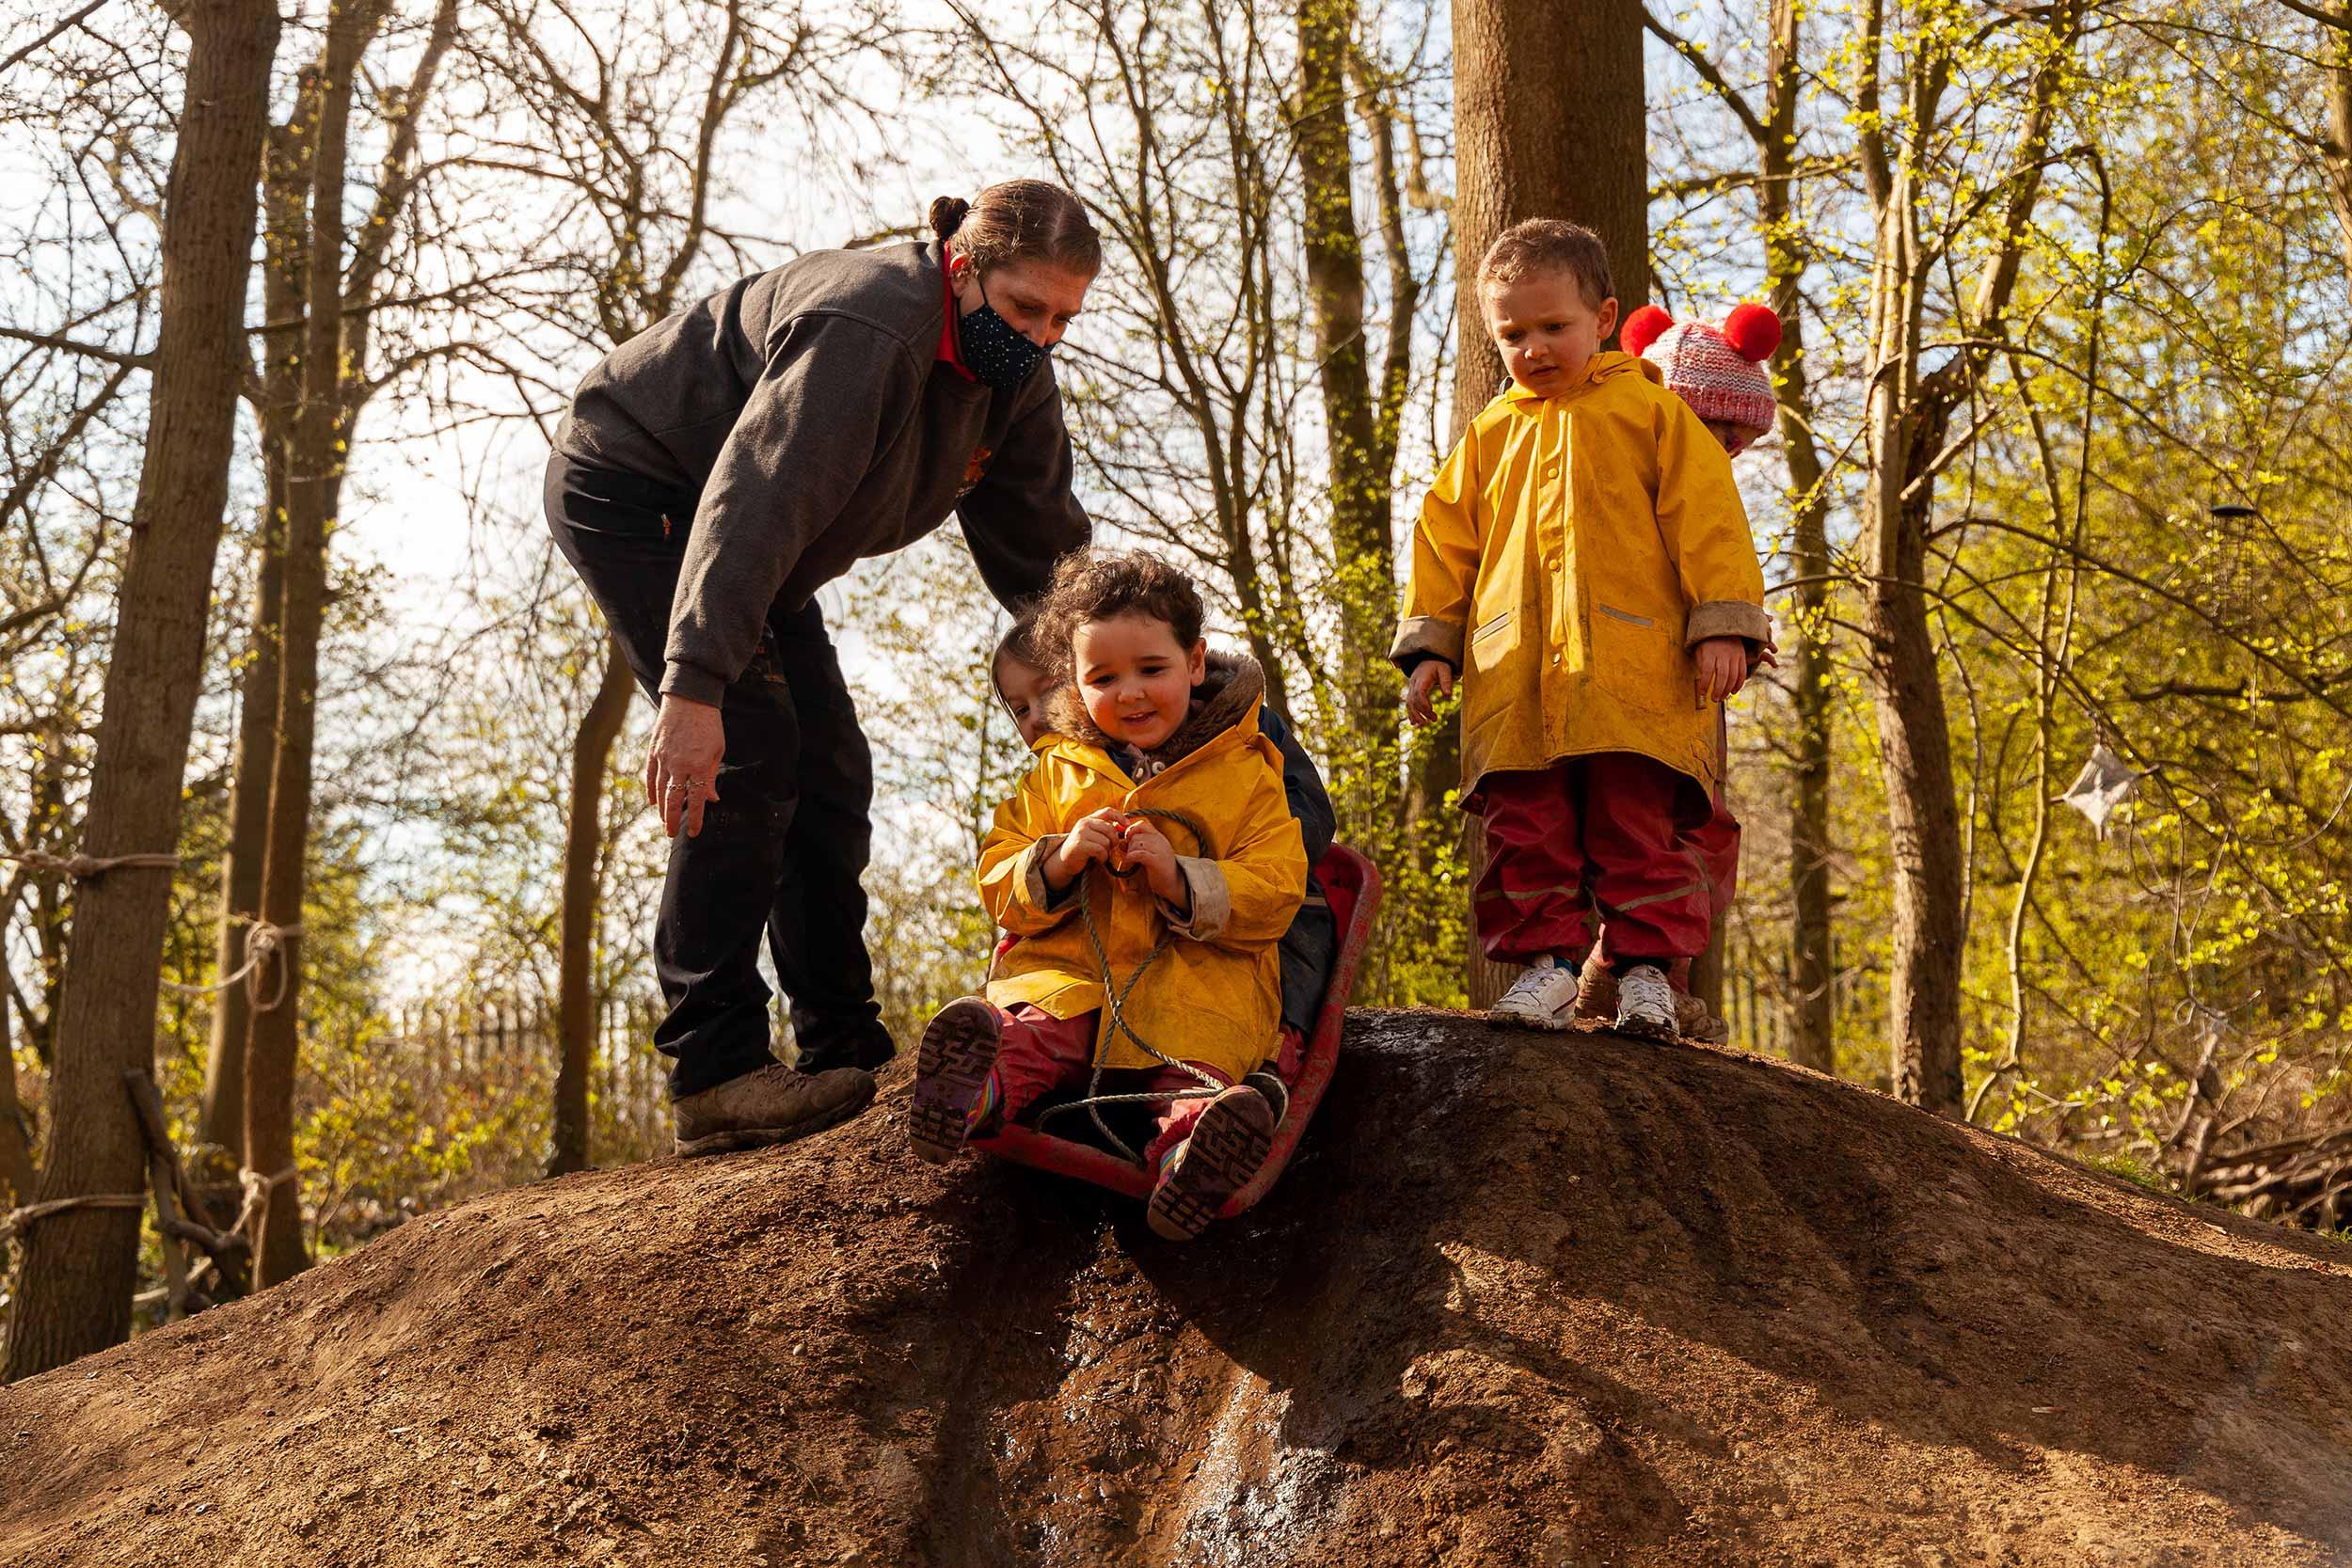 Children sliding down a mud hill